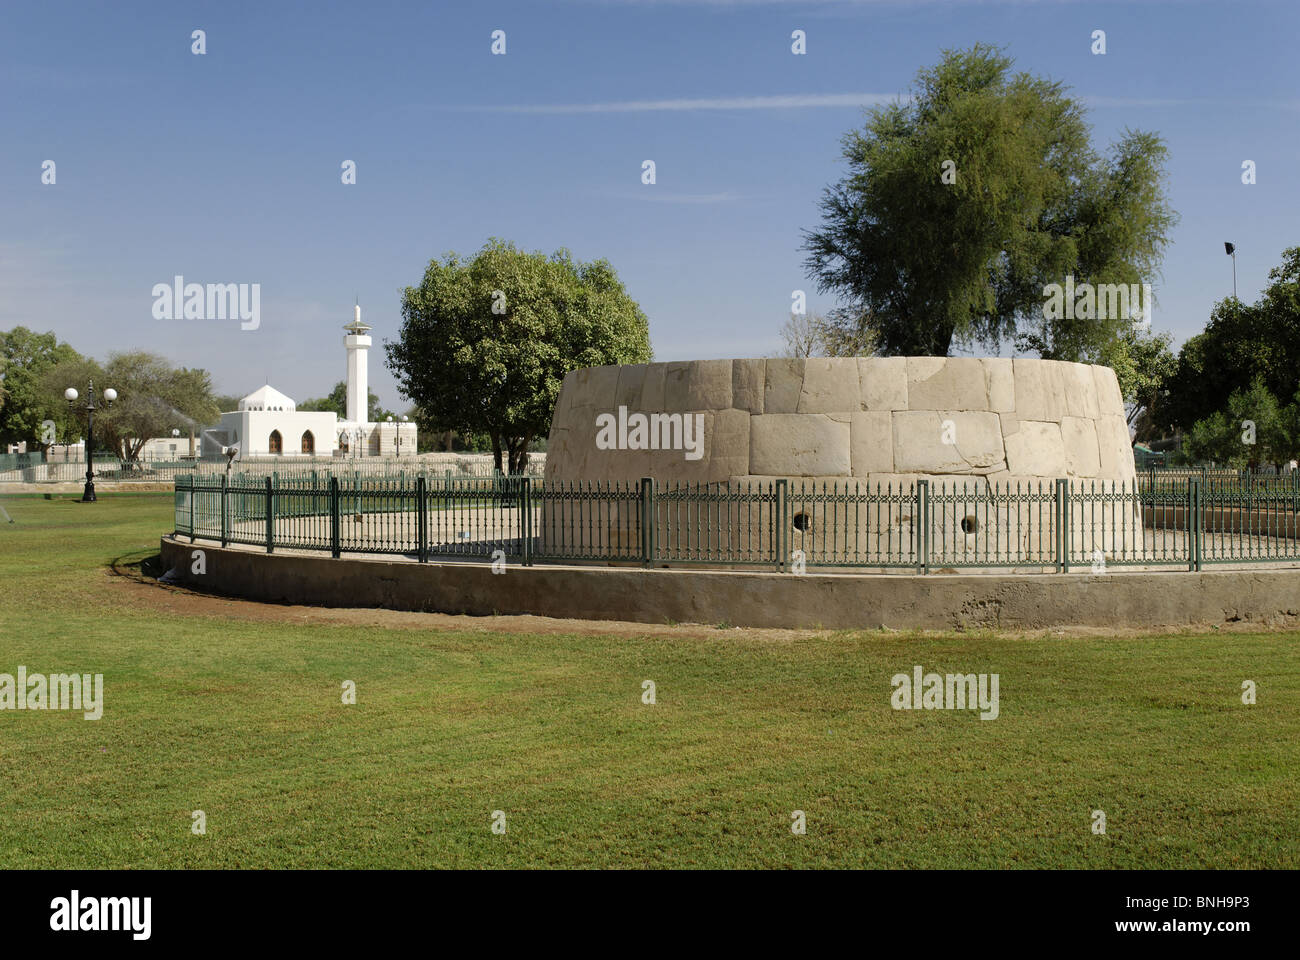 prehistorical grave stone archaeological park Hili oasis Al Ain Abu Dhabi old Arabia Arabic blue sky garden historical - Stock Image